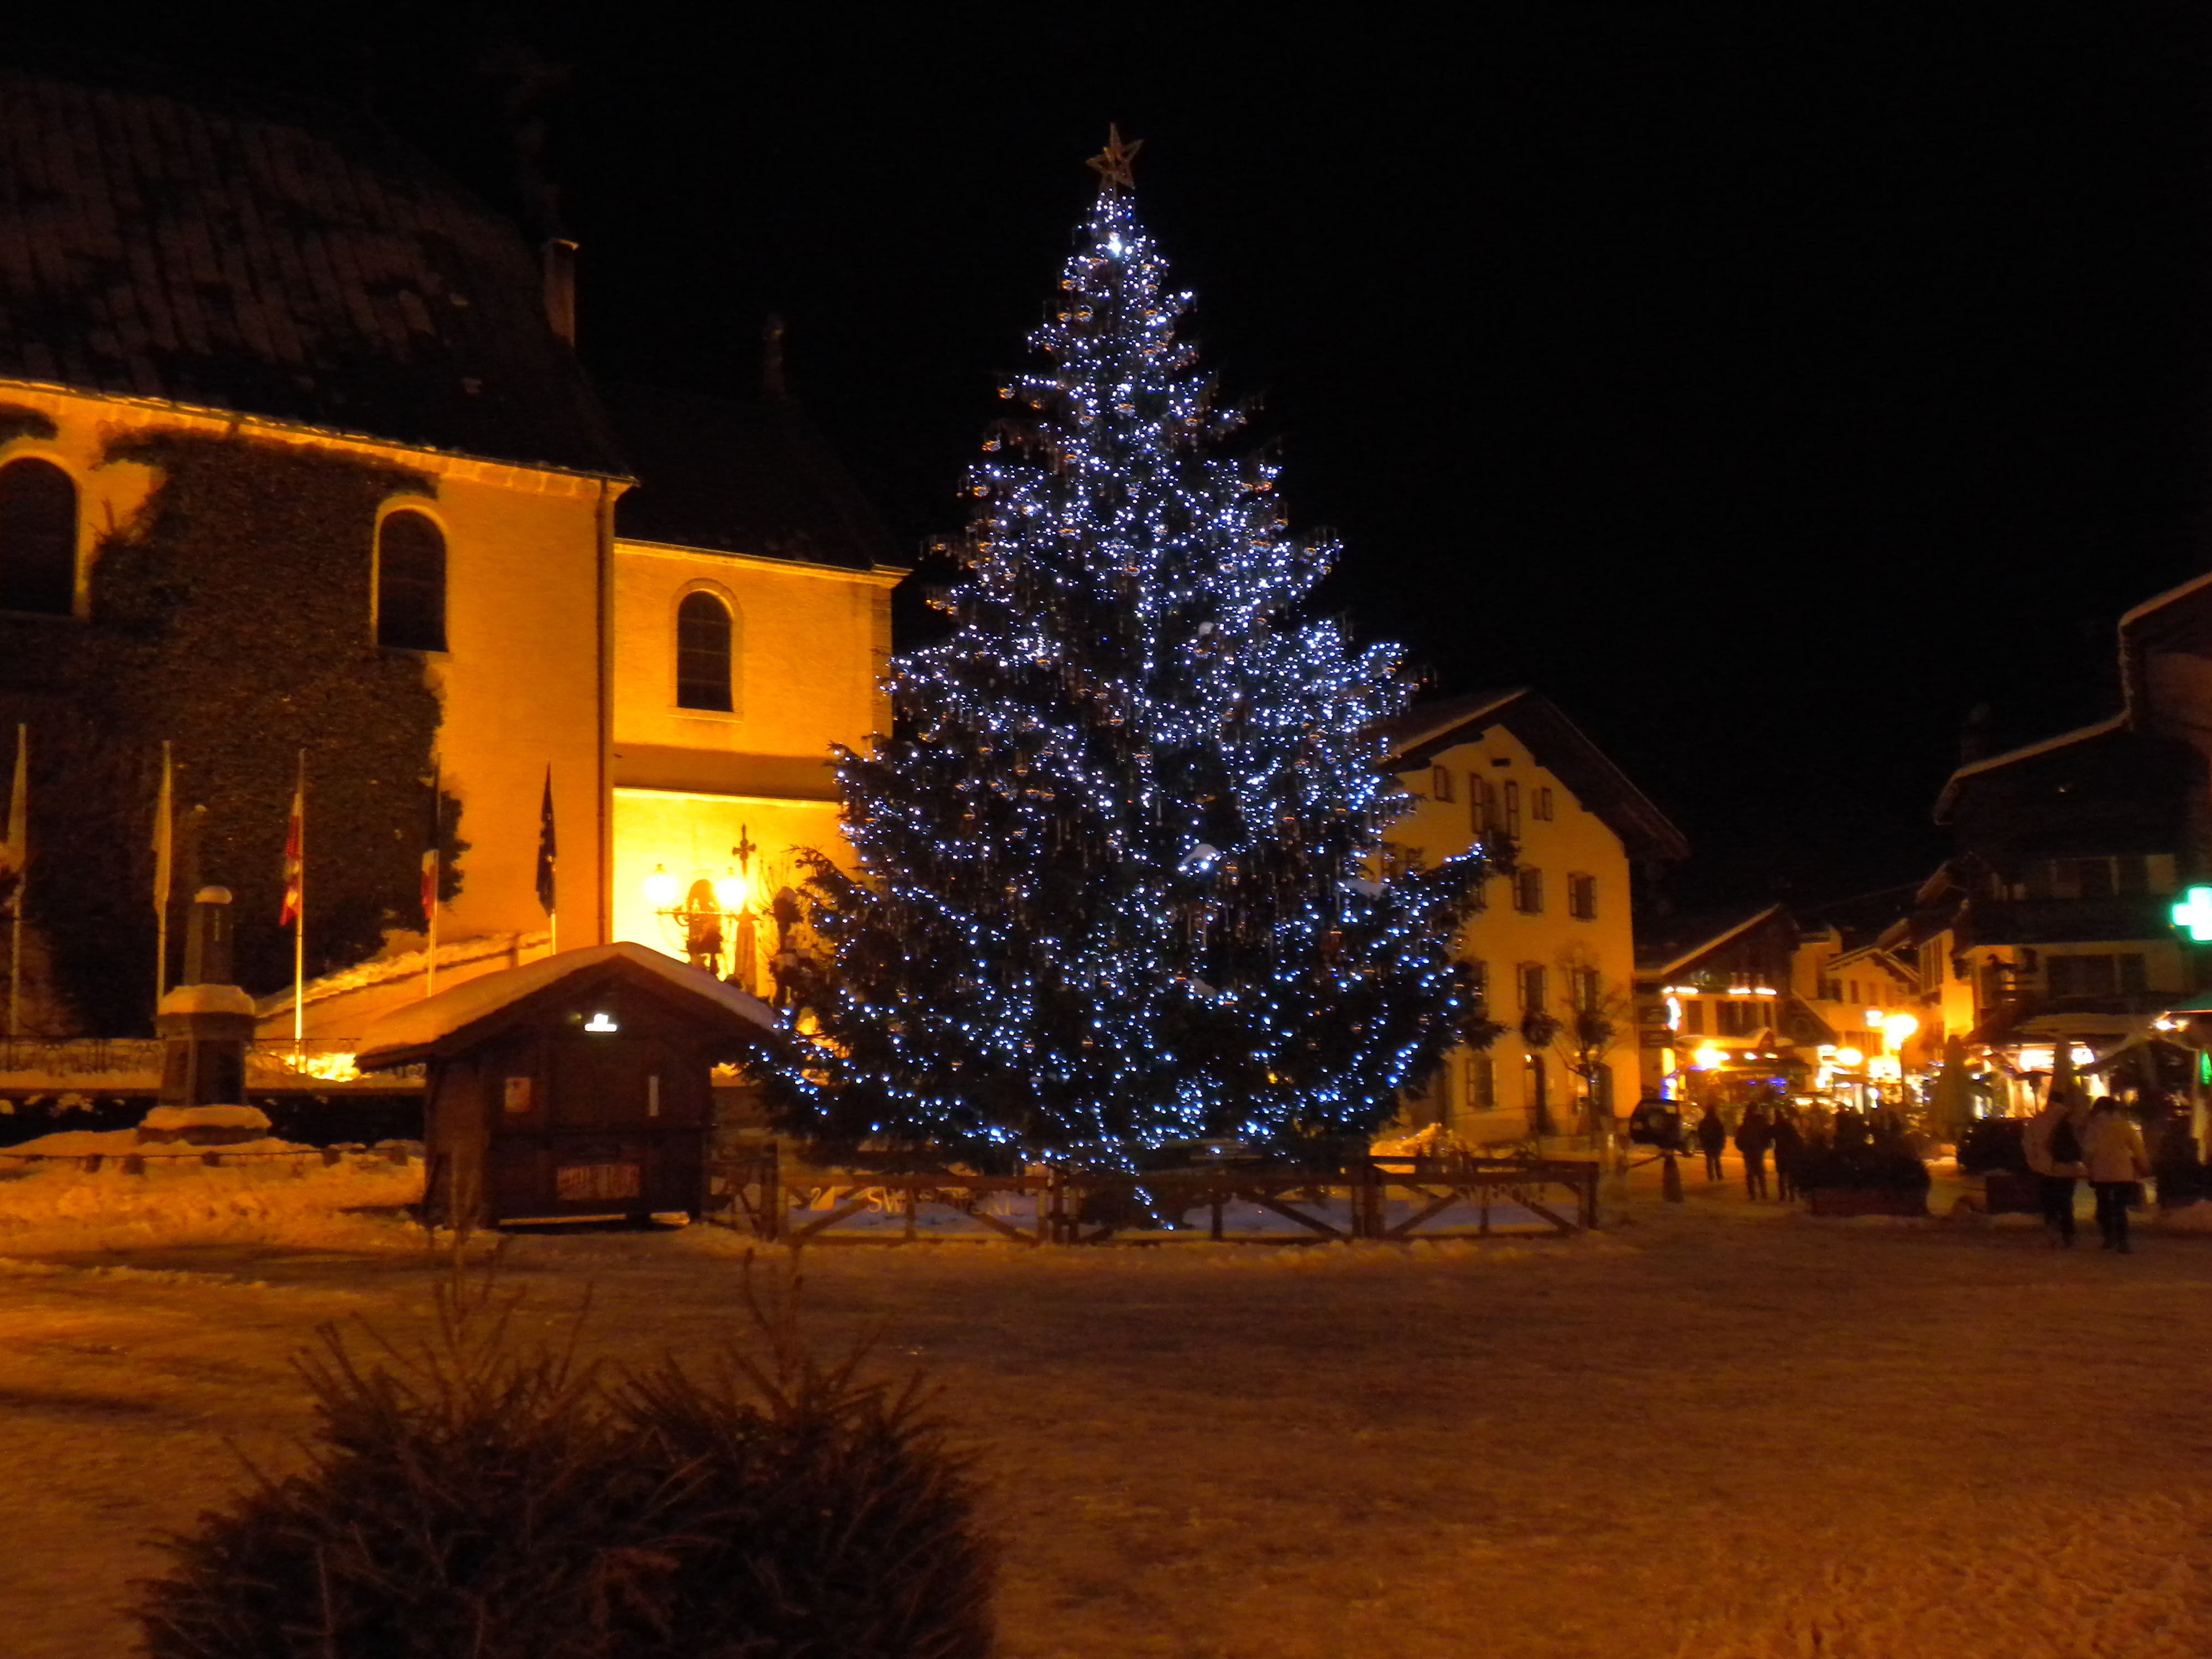 Village by night, Megeve